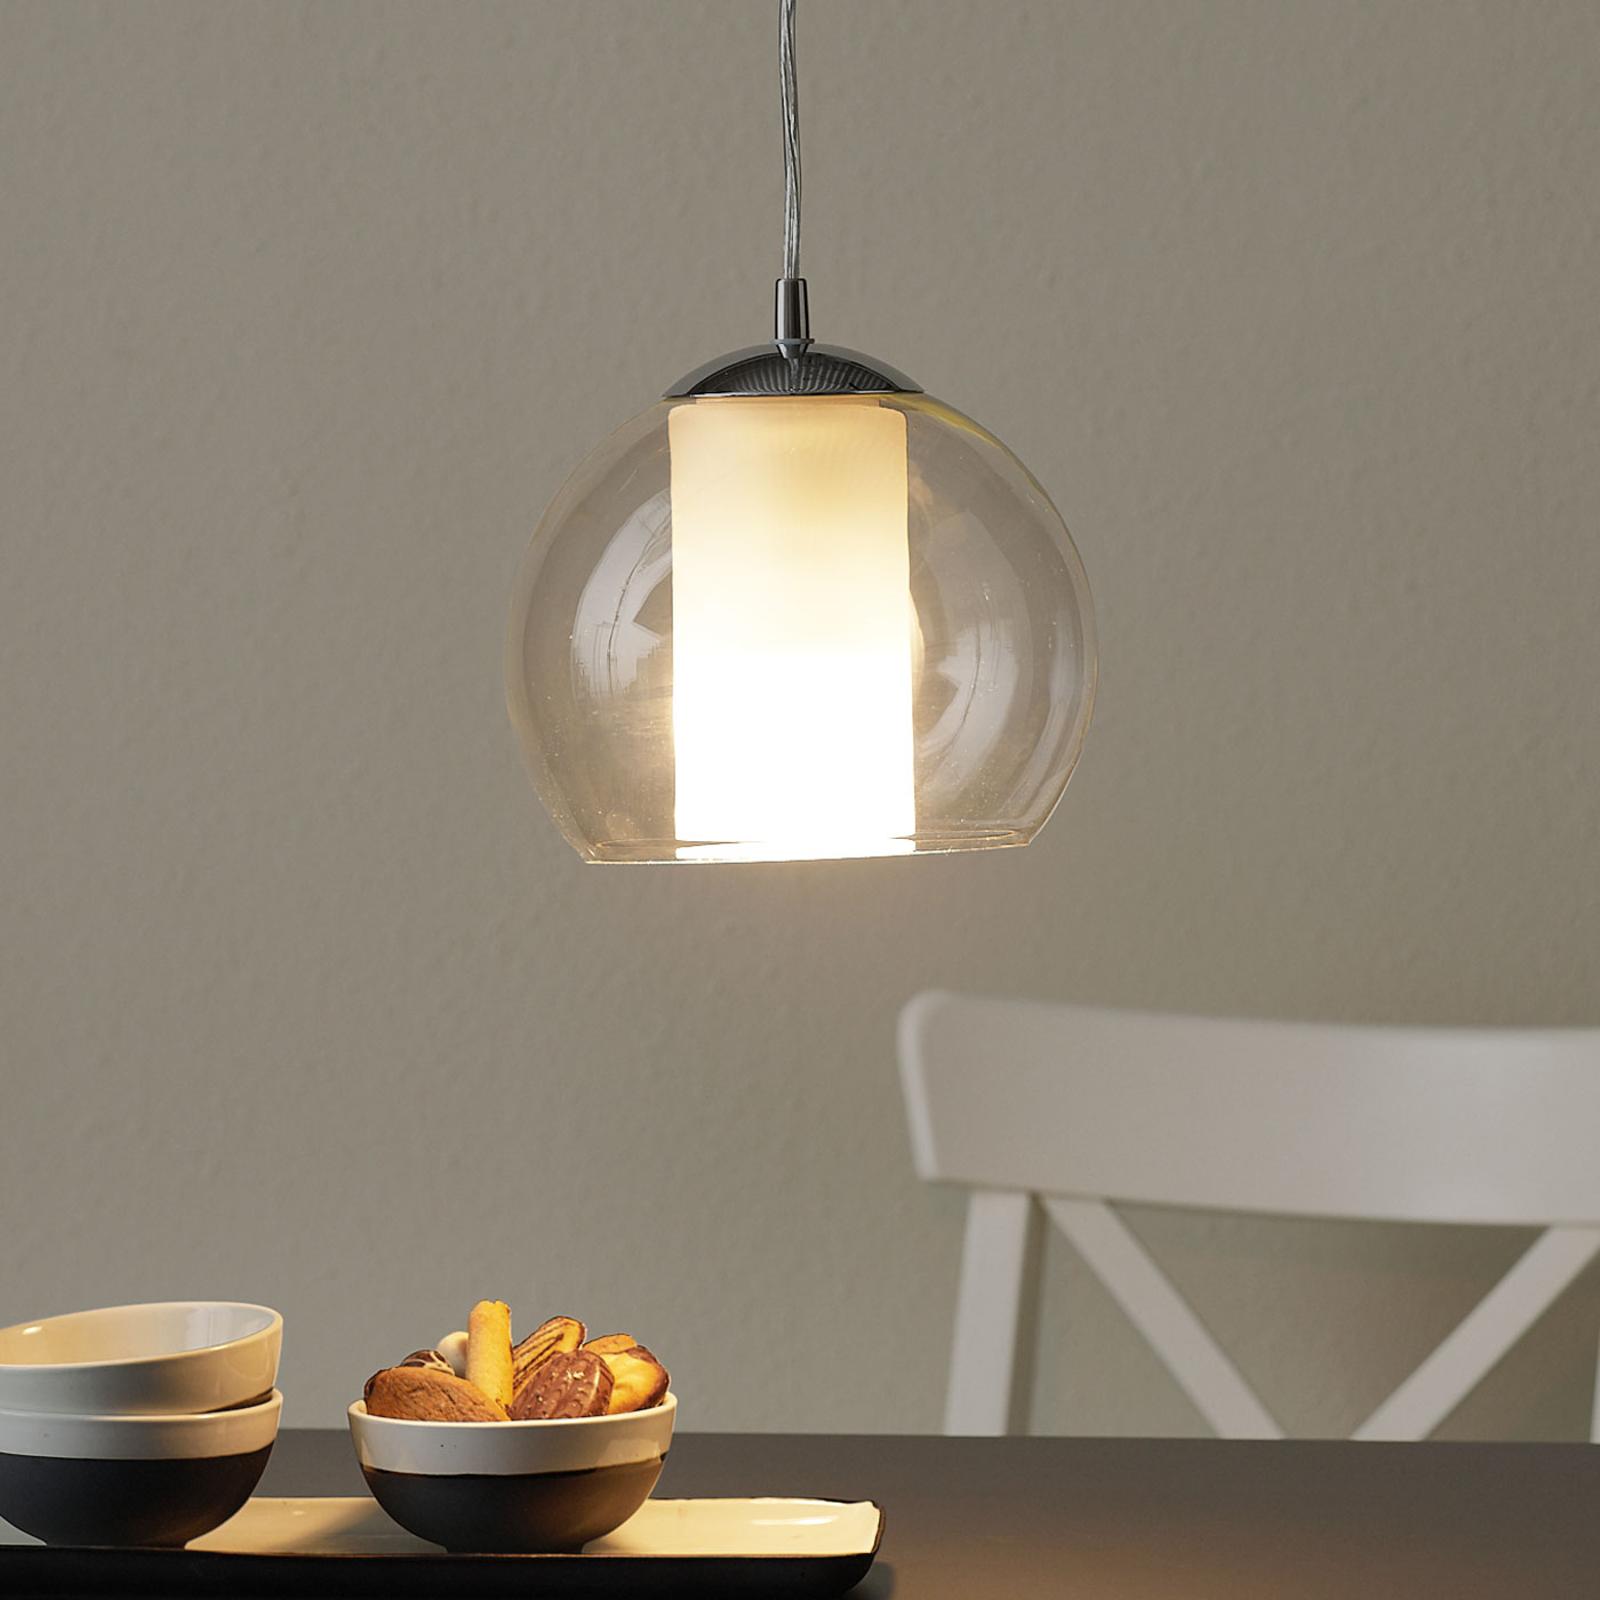 Classic Bolsano glass pendant light_3031643_1